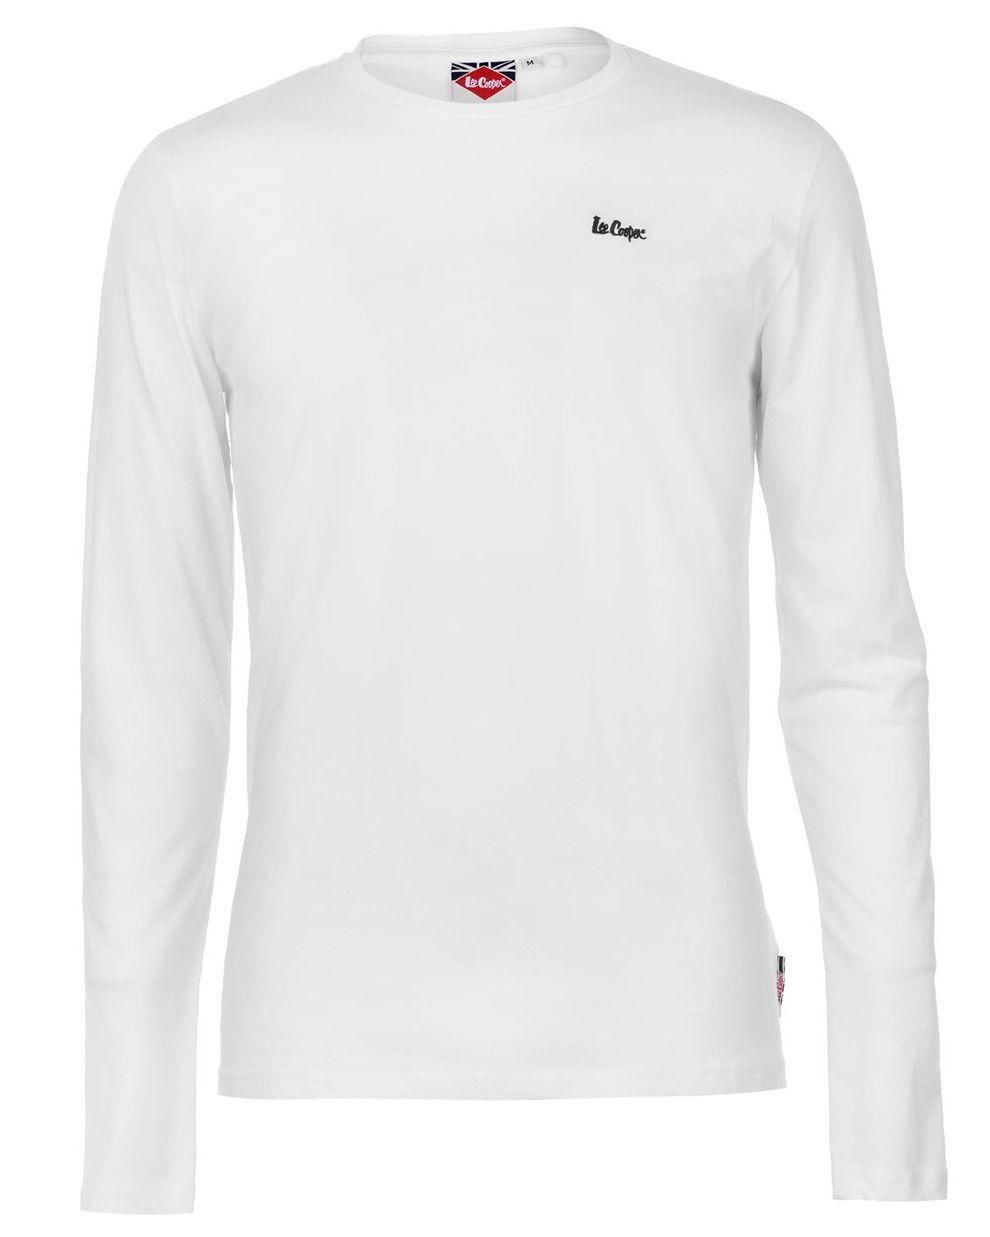 Pánske tričko Lee Cooper  6bce65ade95